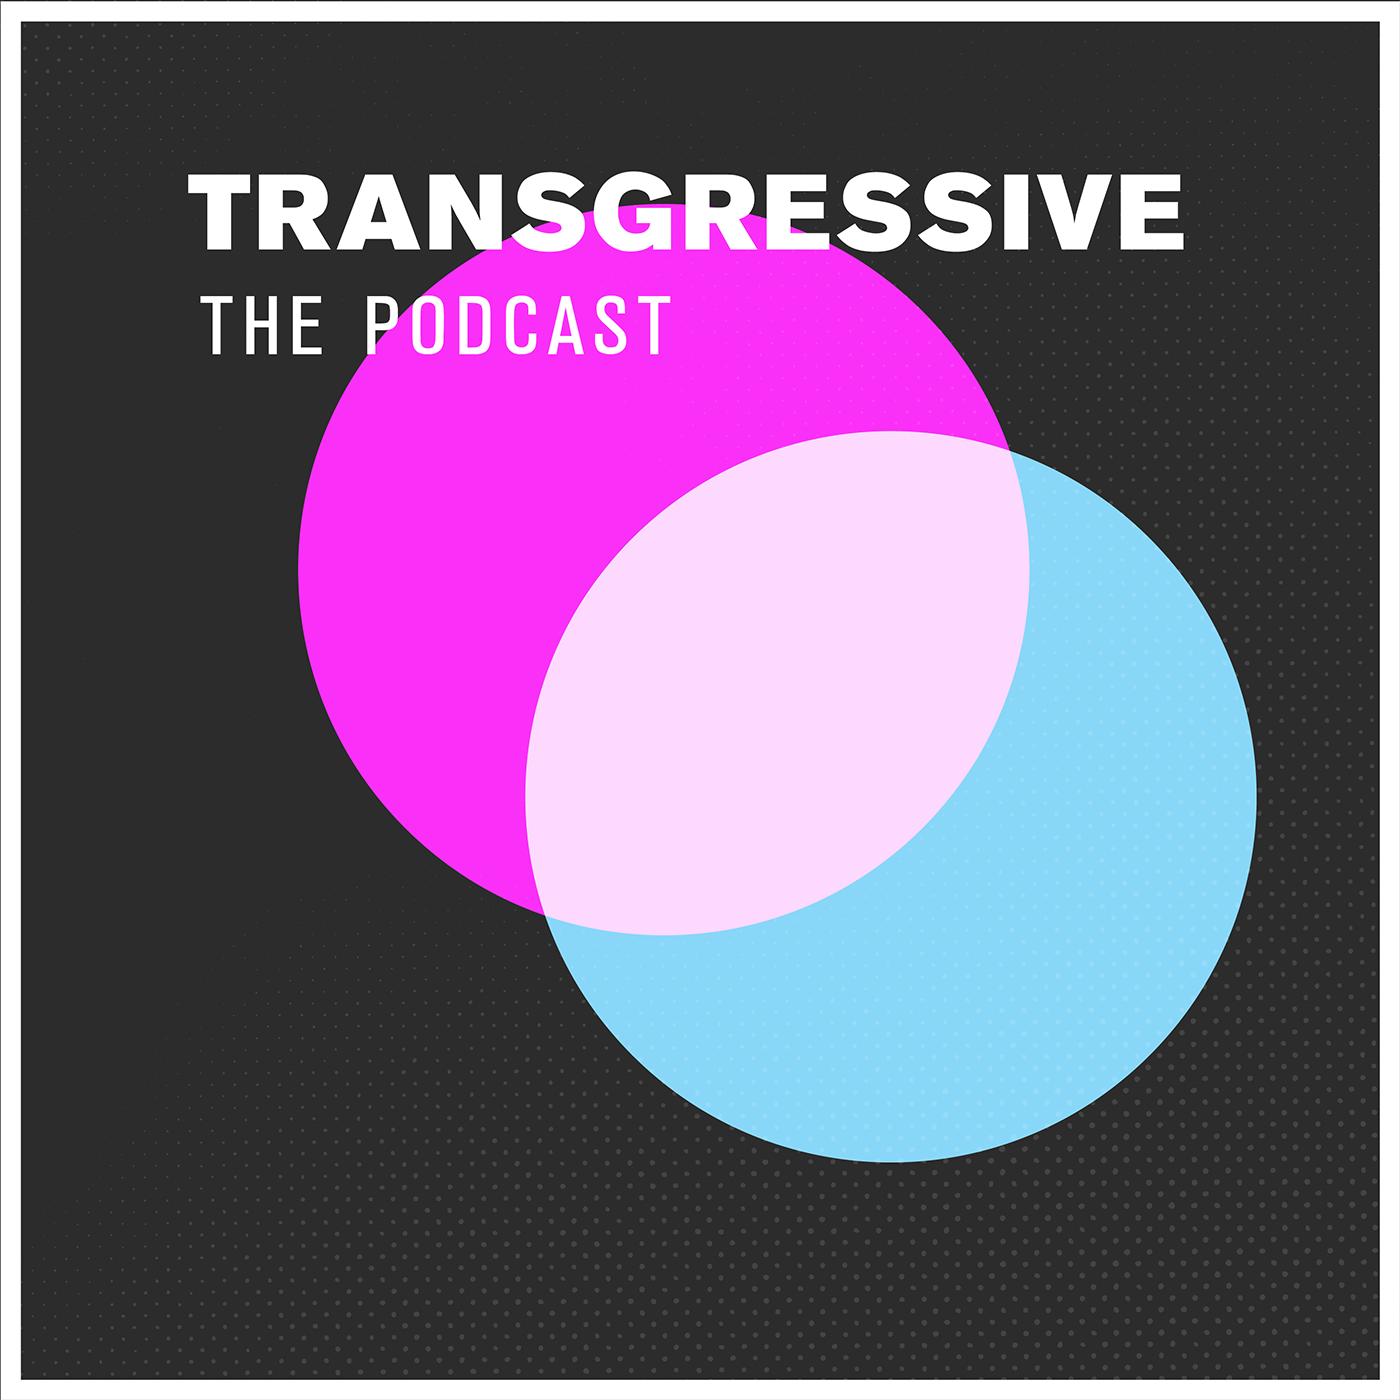 Transgressive: The Podcast show art